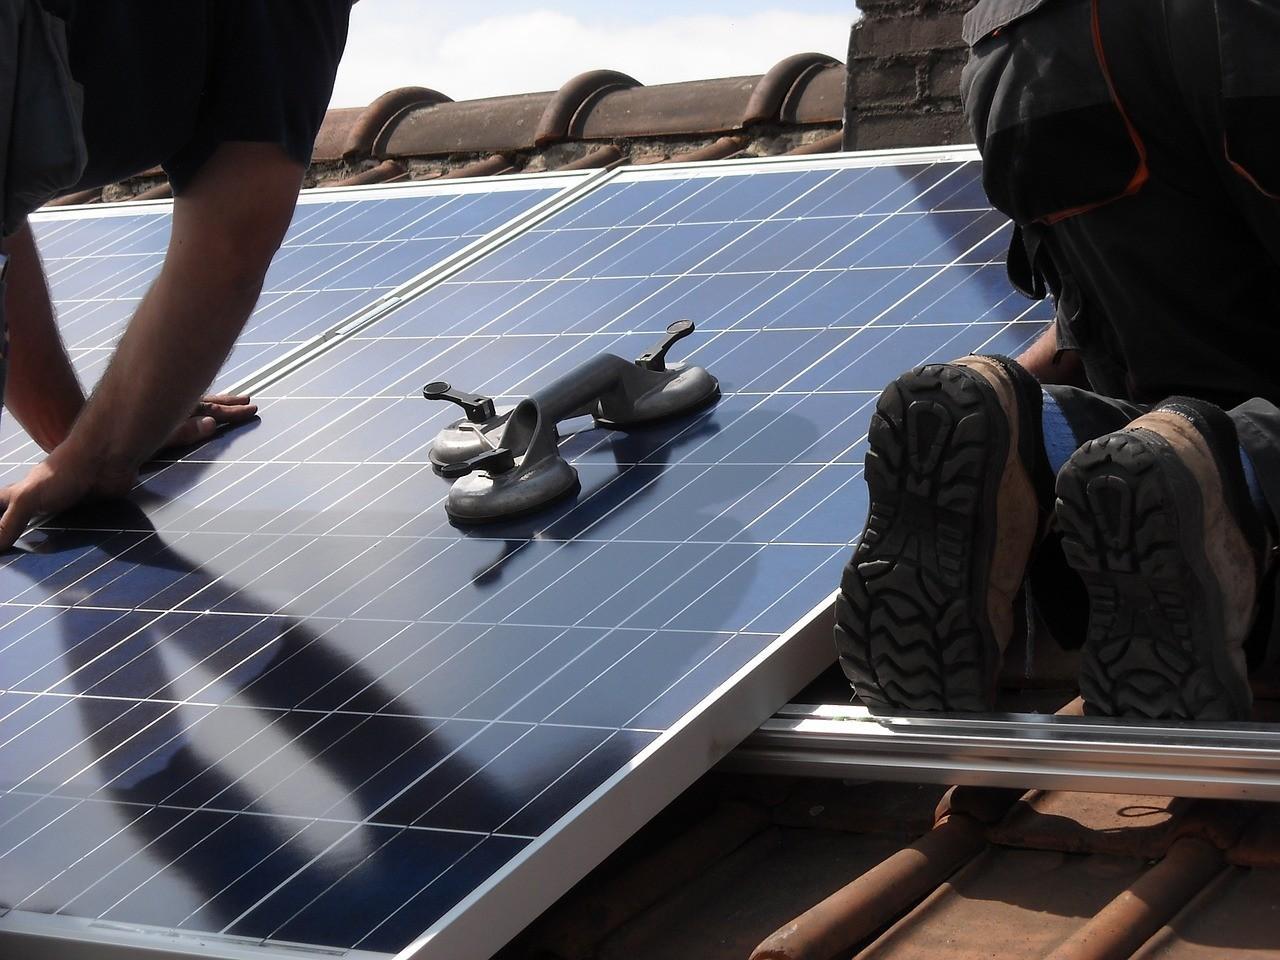 solar-panels-944002_1280-1.jpg